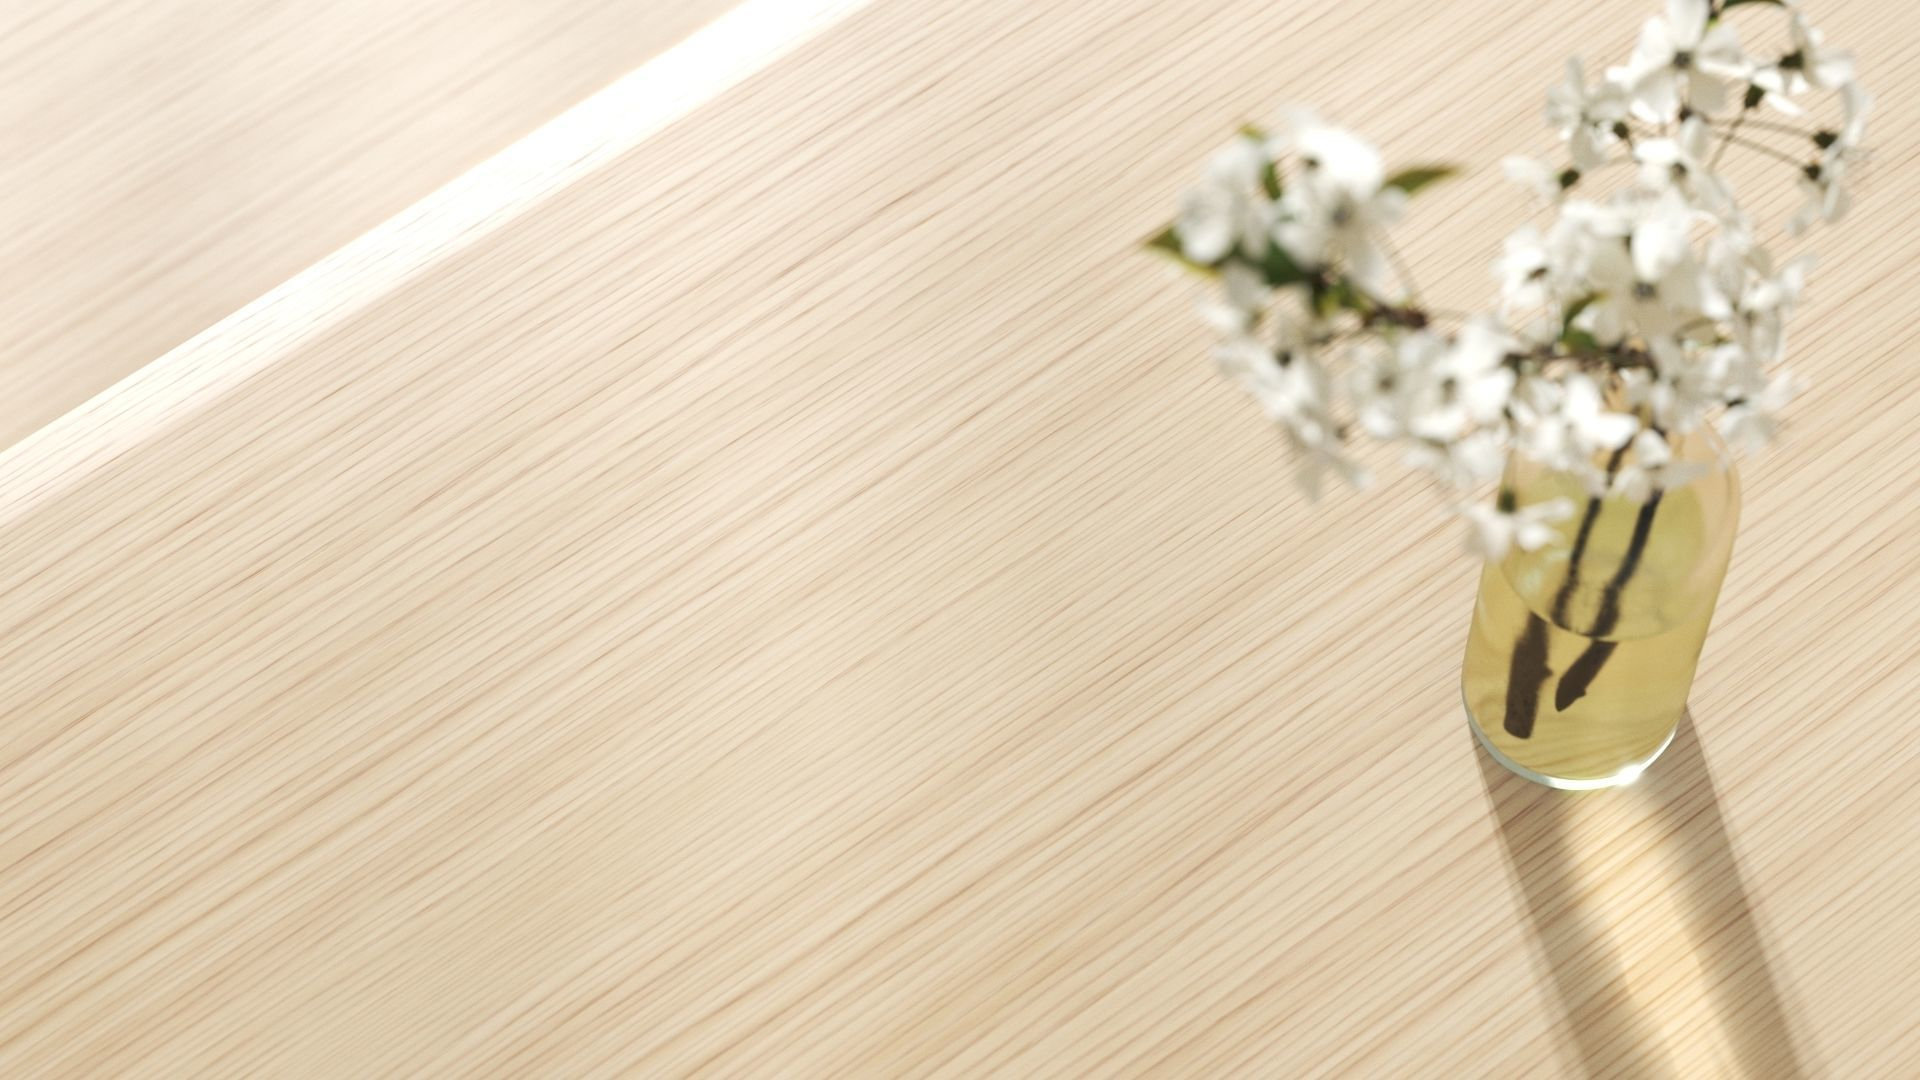 Read oak veneer texture